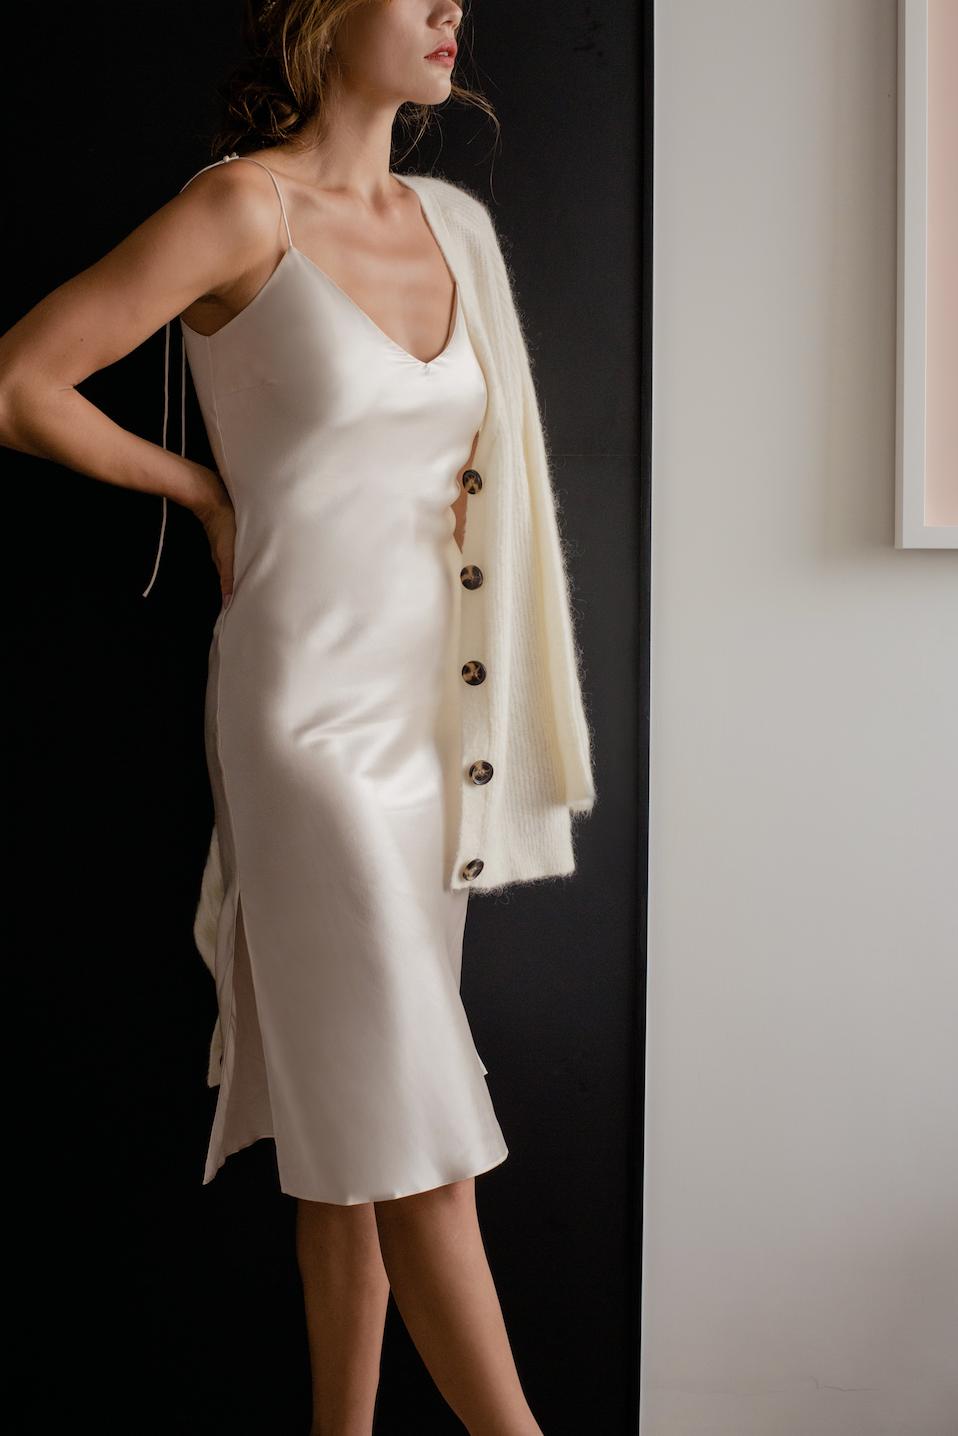 fe1d9d376a57 Silk slip | Silk dress layering | White silk dress | Elegant silk dress |  Elegant slip dress | Slip dress outfit ideas fall | Silk slip dress midi |  White ...